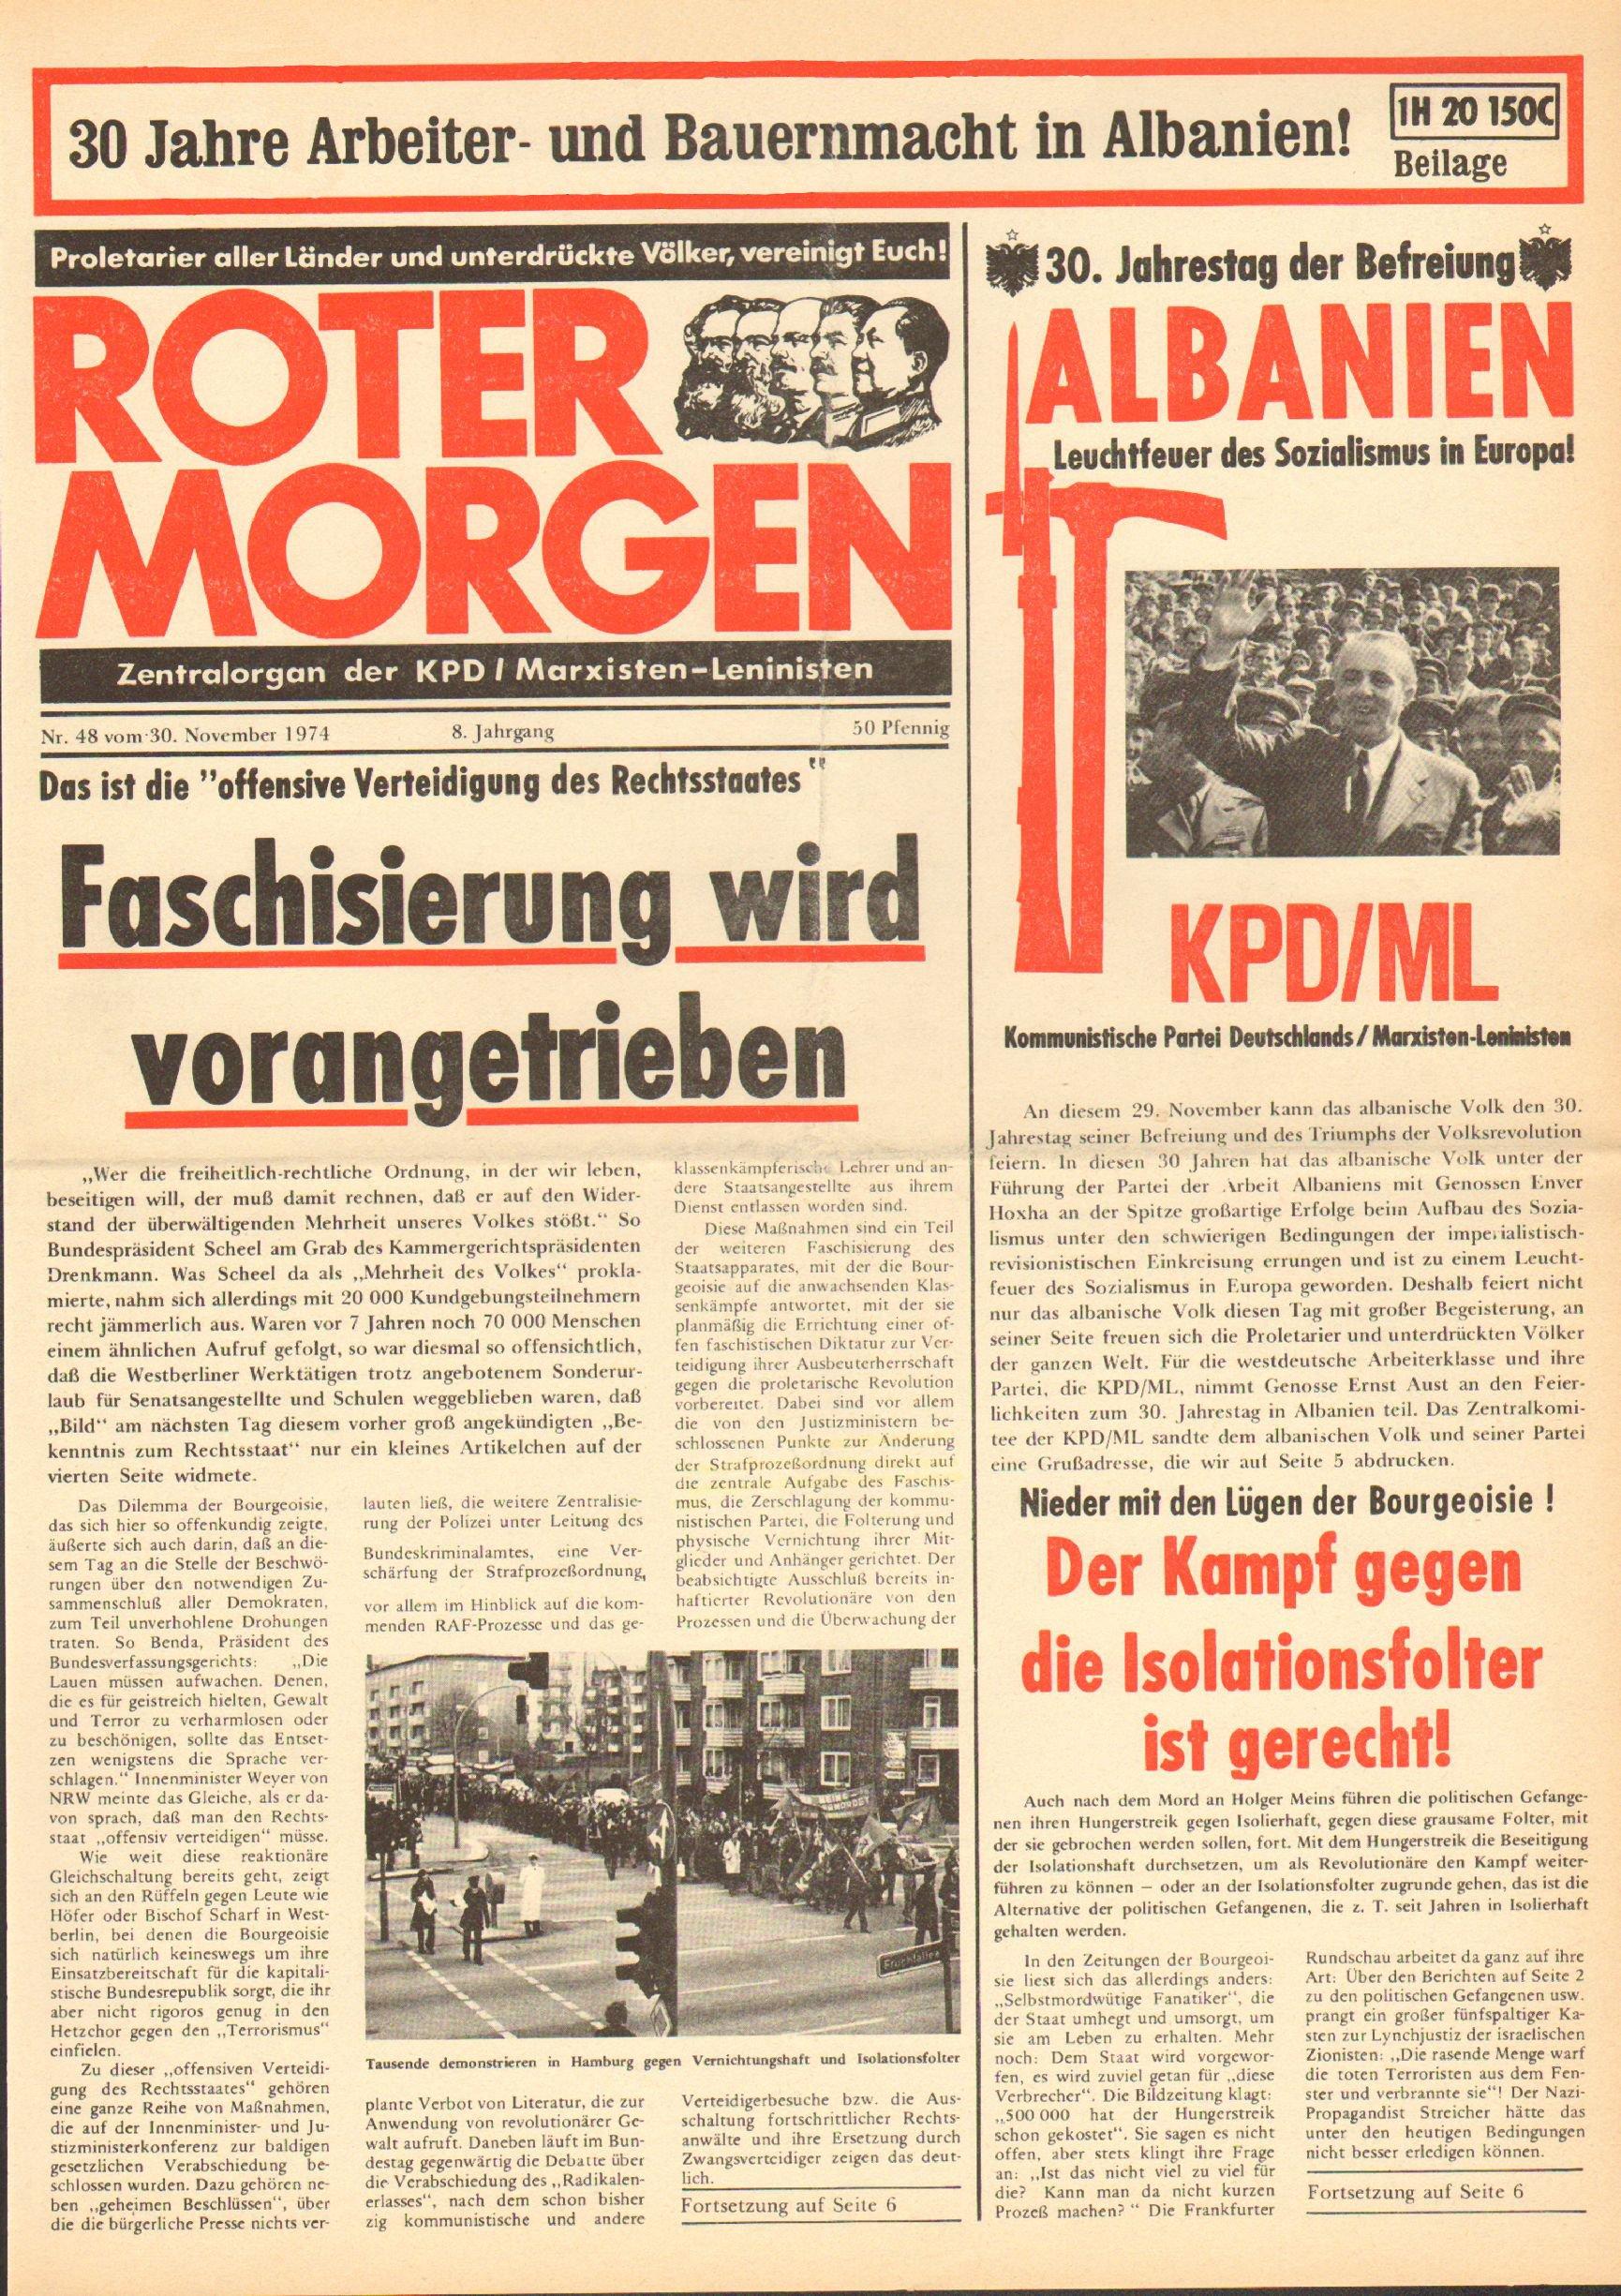 Roter Morgen, 8. Jg., 30. November 1974, Nr. 48, Seite 1